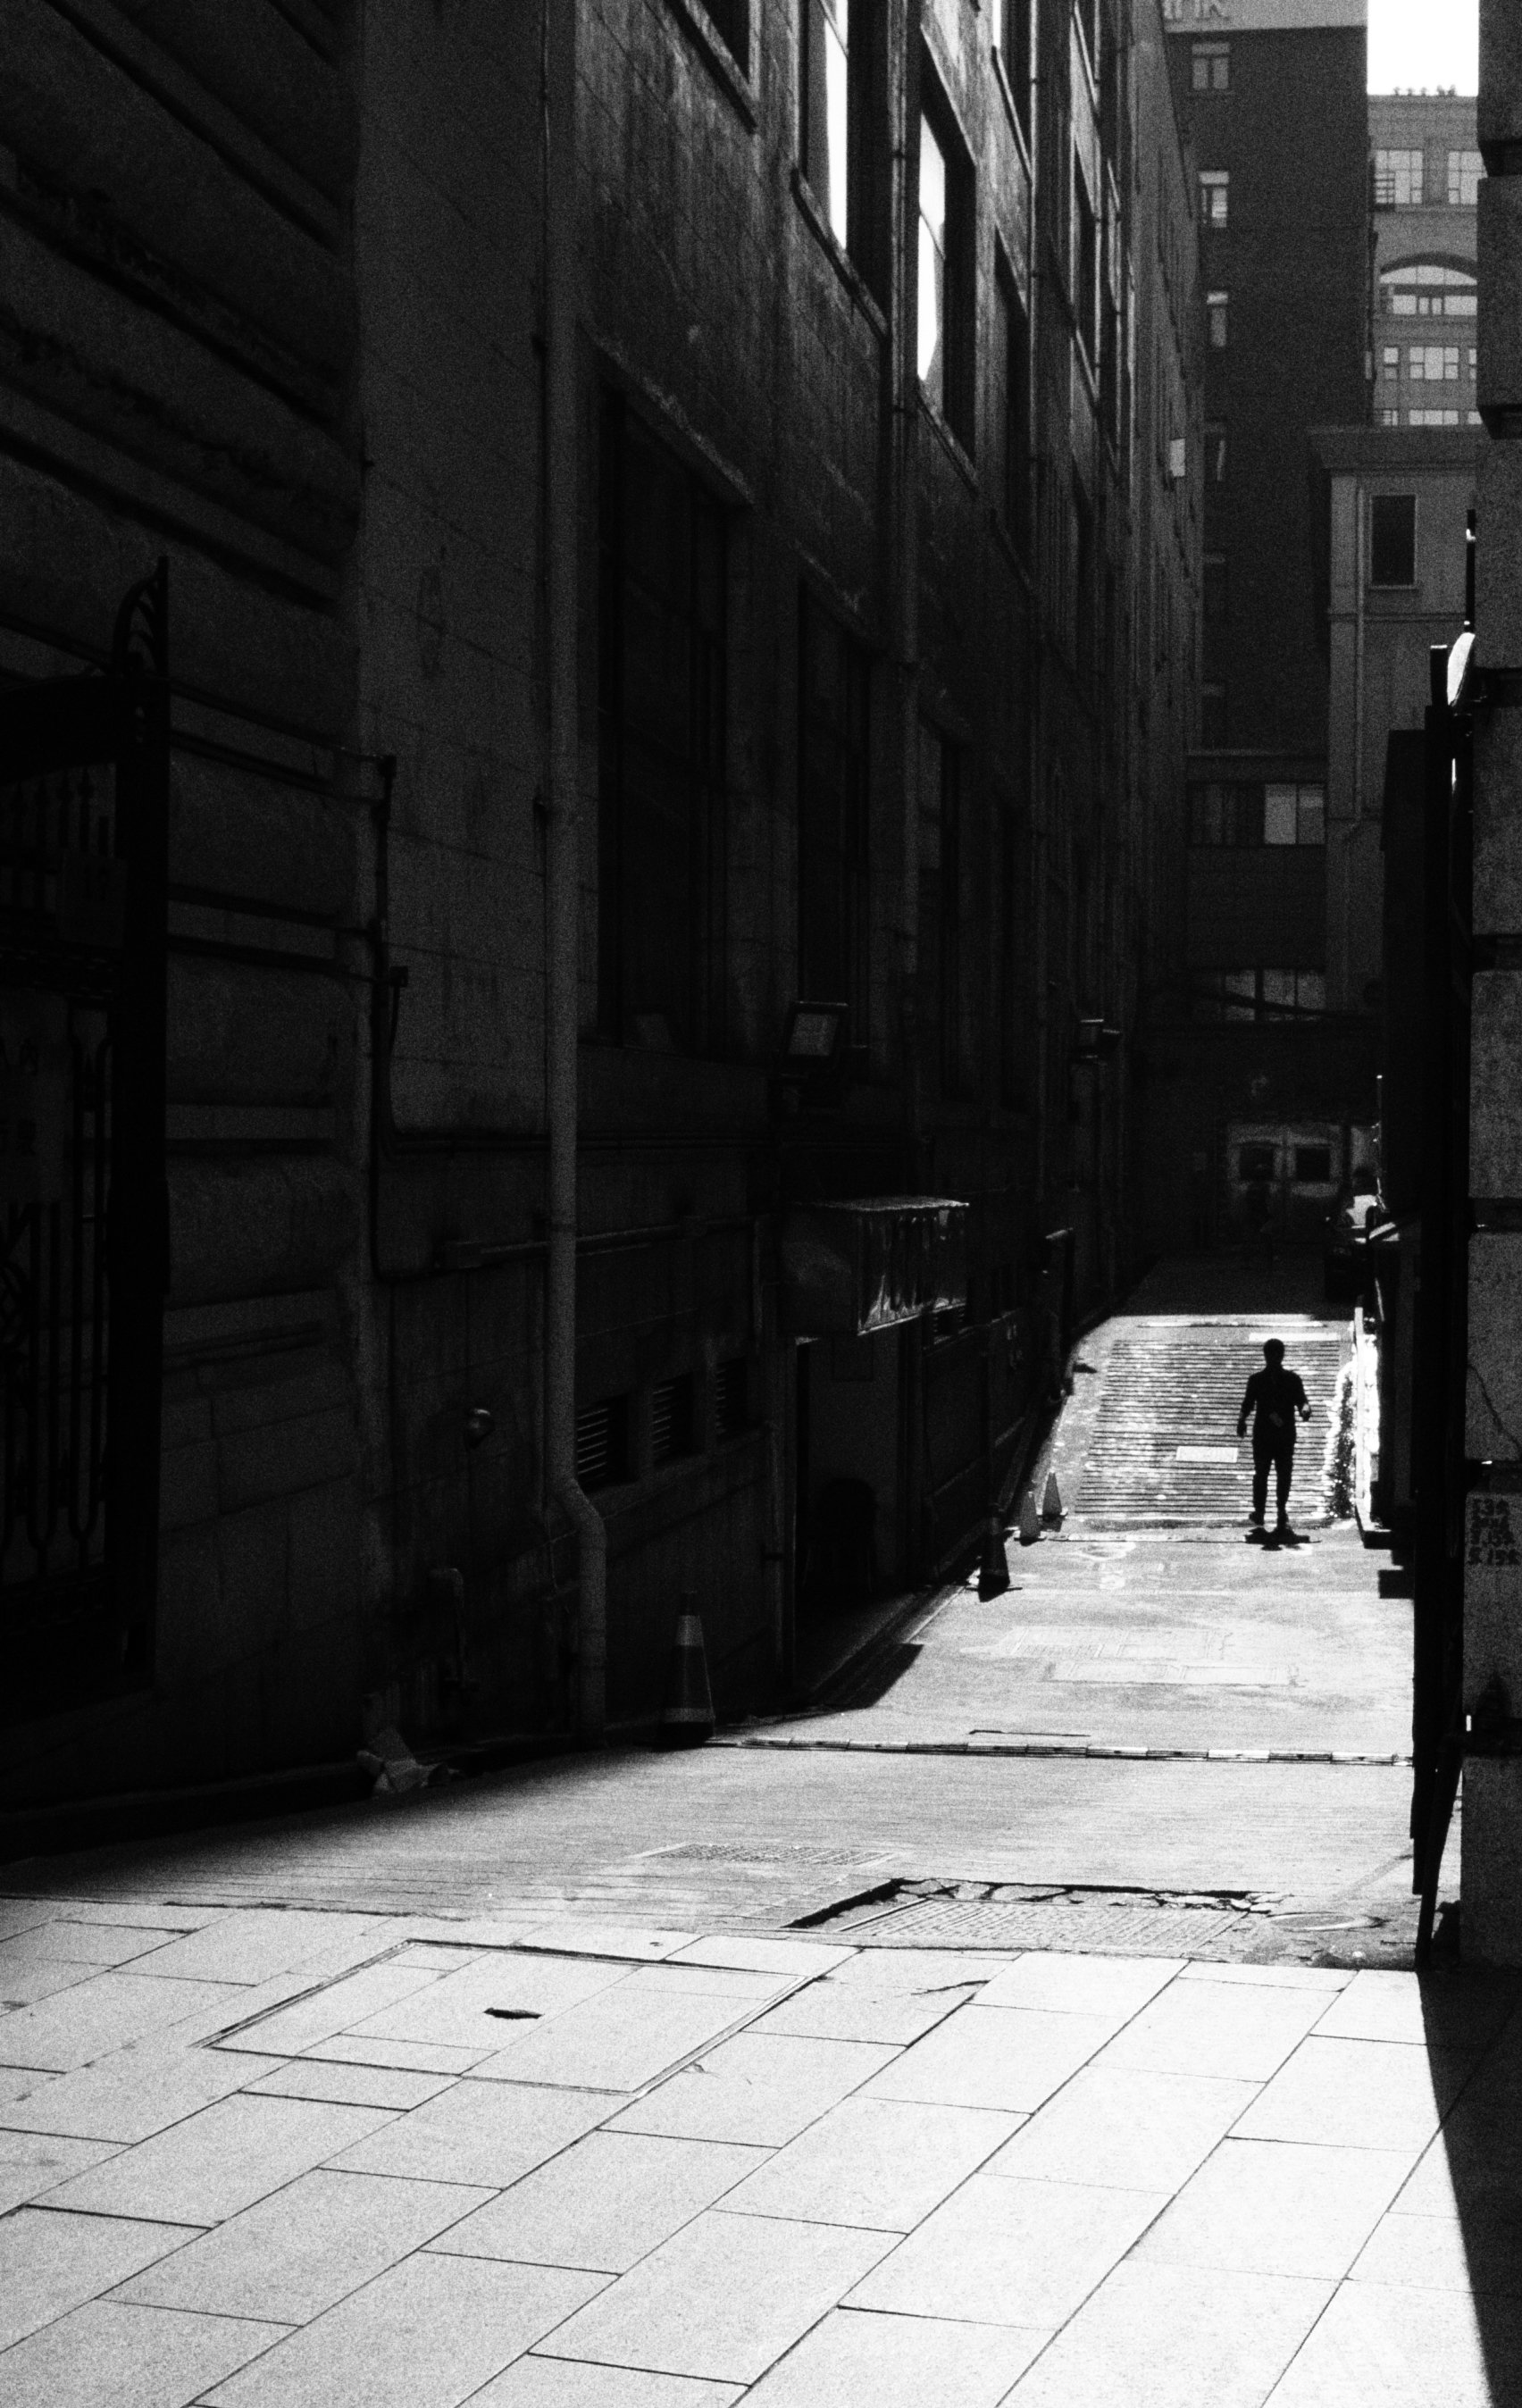 street , street photography, black and white, yajun.hu